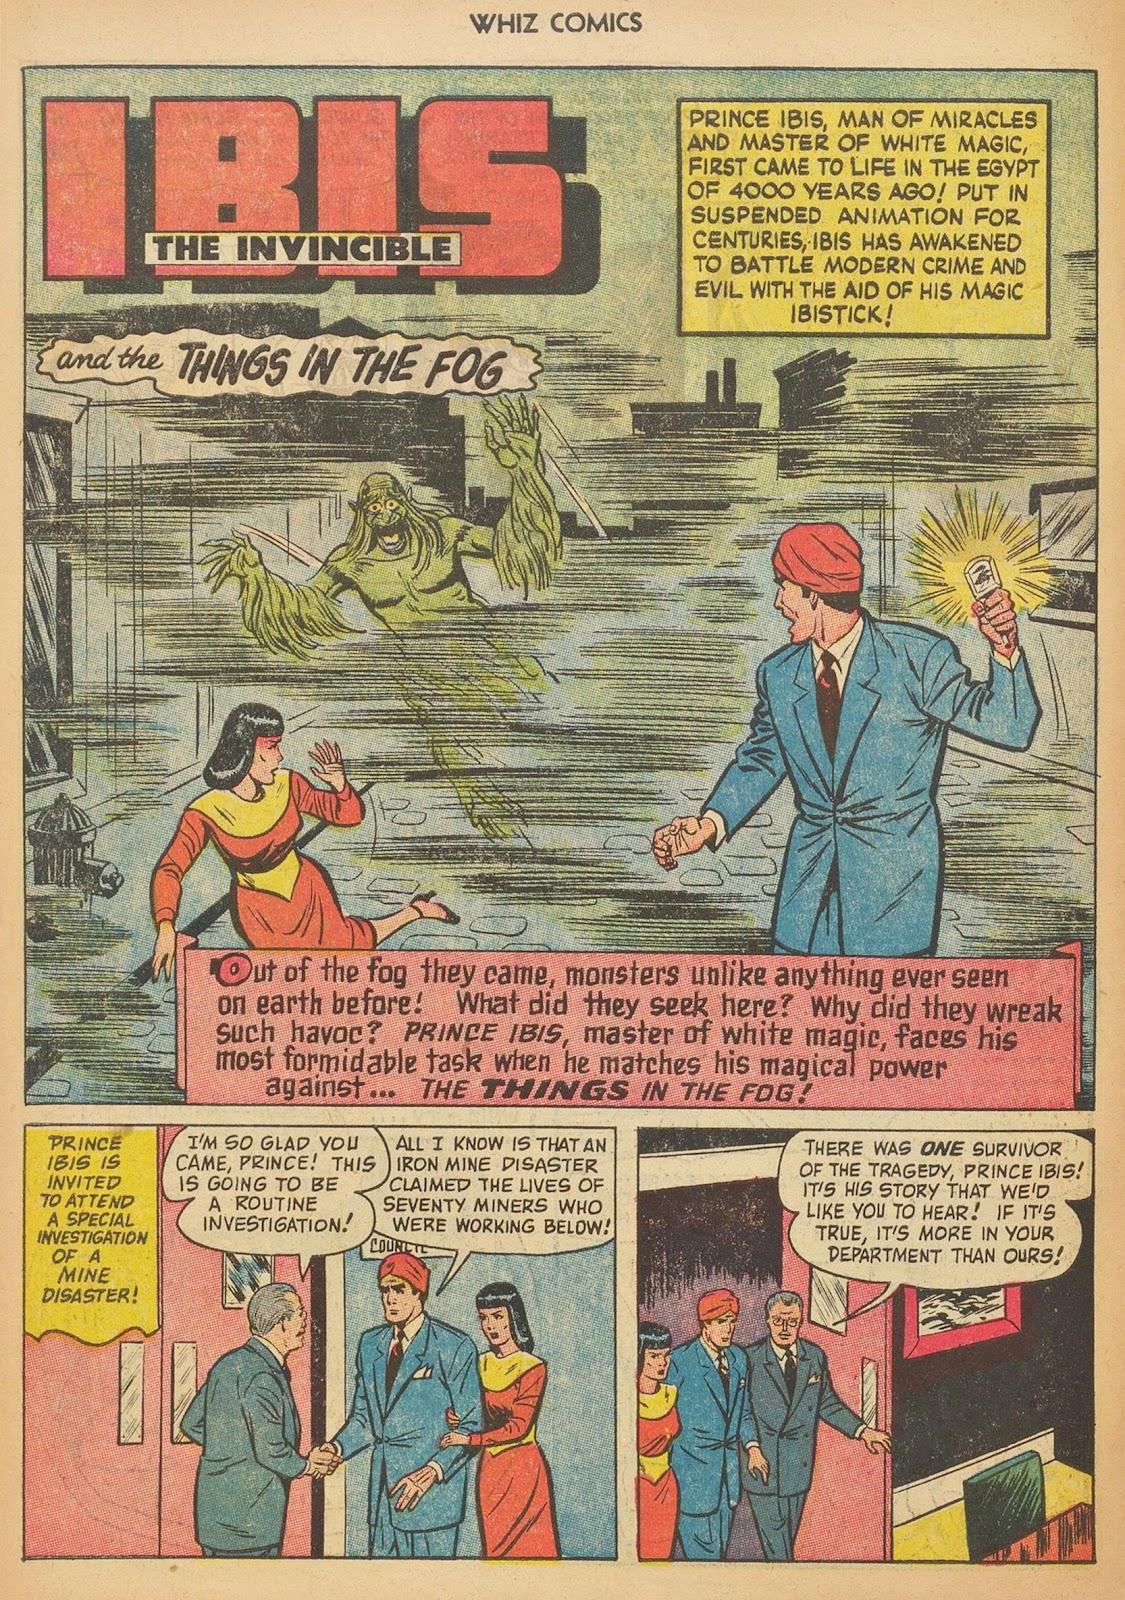 Read online WHIZ Comics comic -  Issue #153 - 10